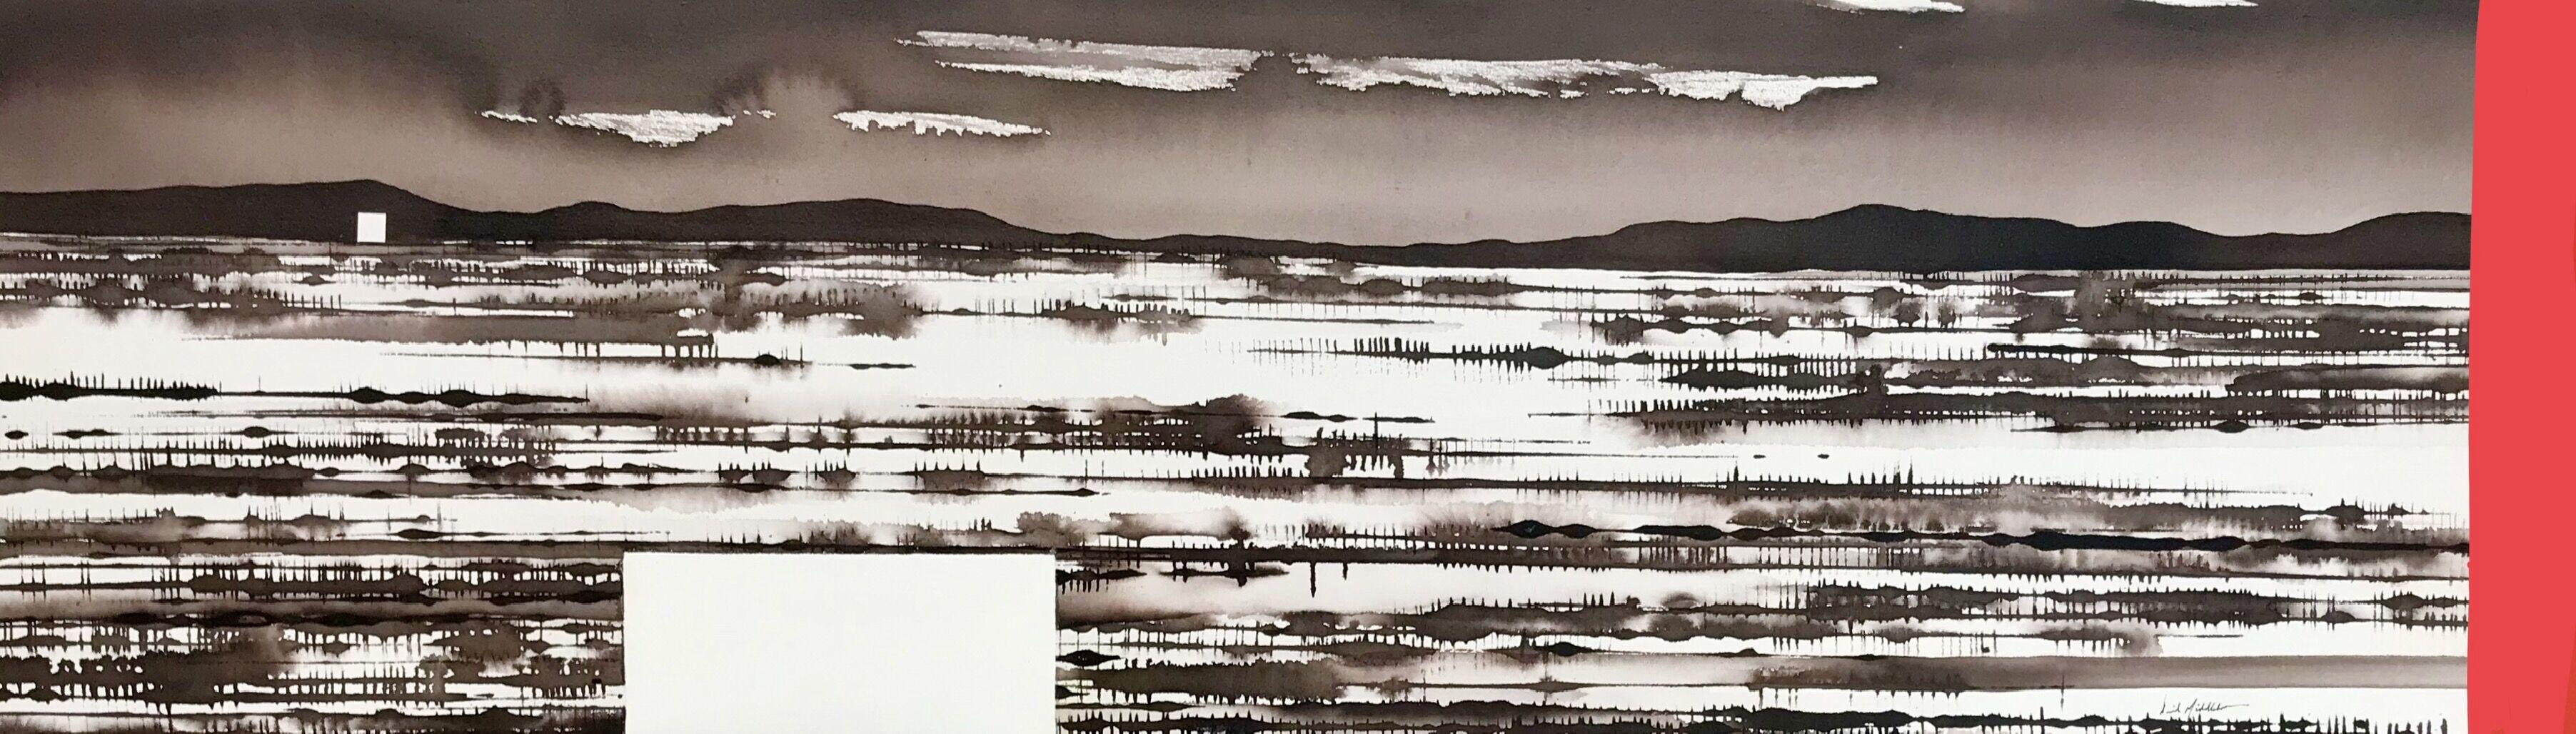 Art Atrium David Middlebrook Desert Fields and icon, Central Australia